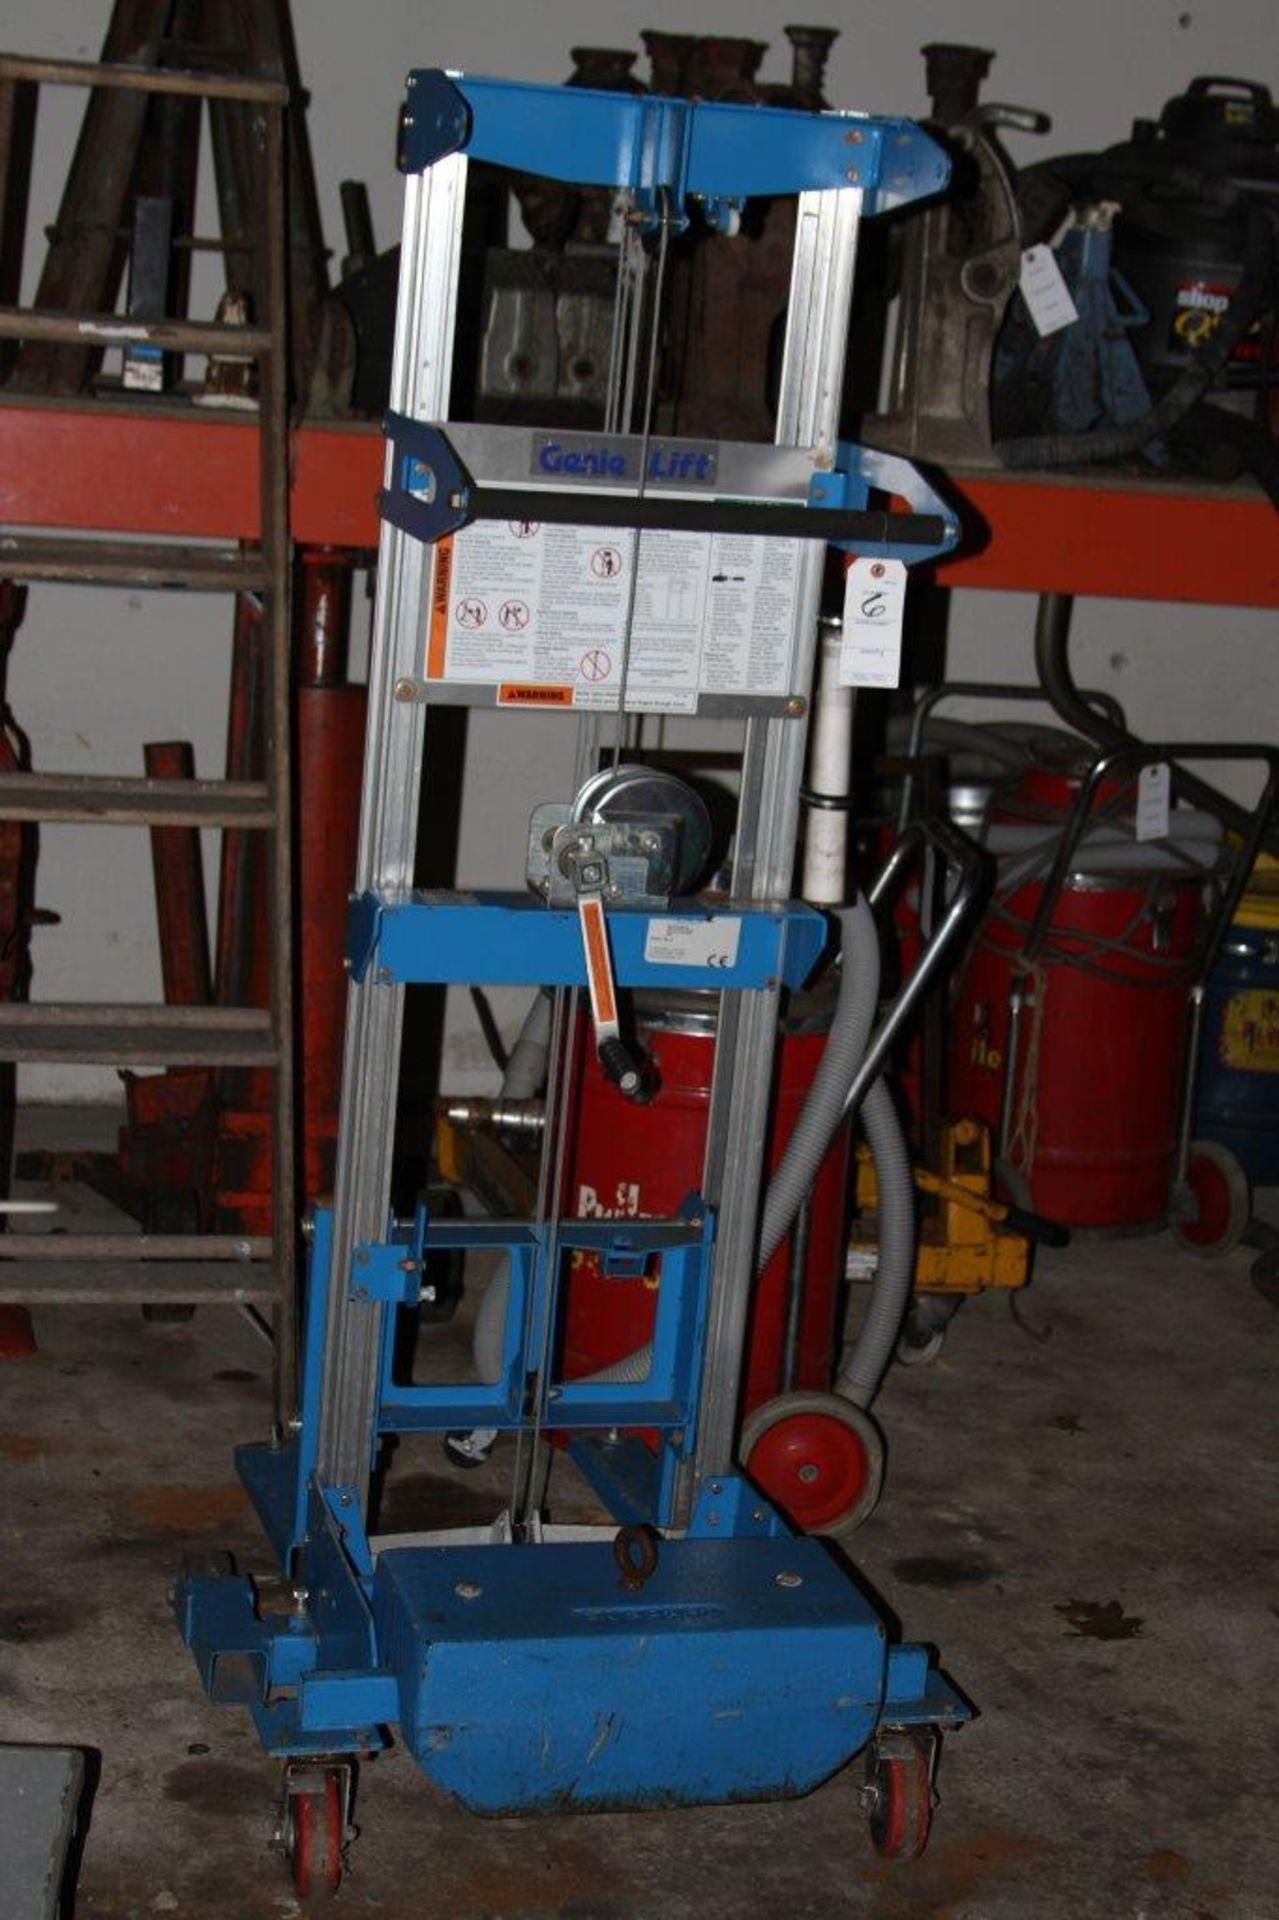 Lot 6 - Genie Lift 400 Pound Capacity P/N 38362